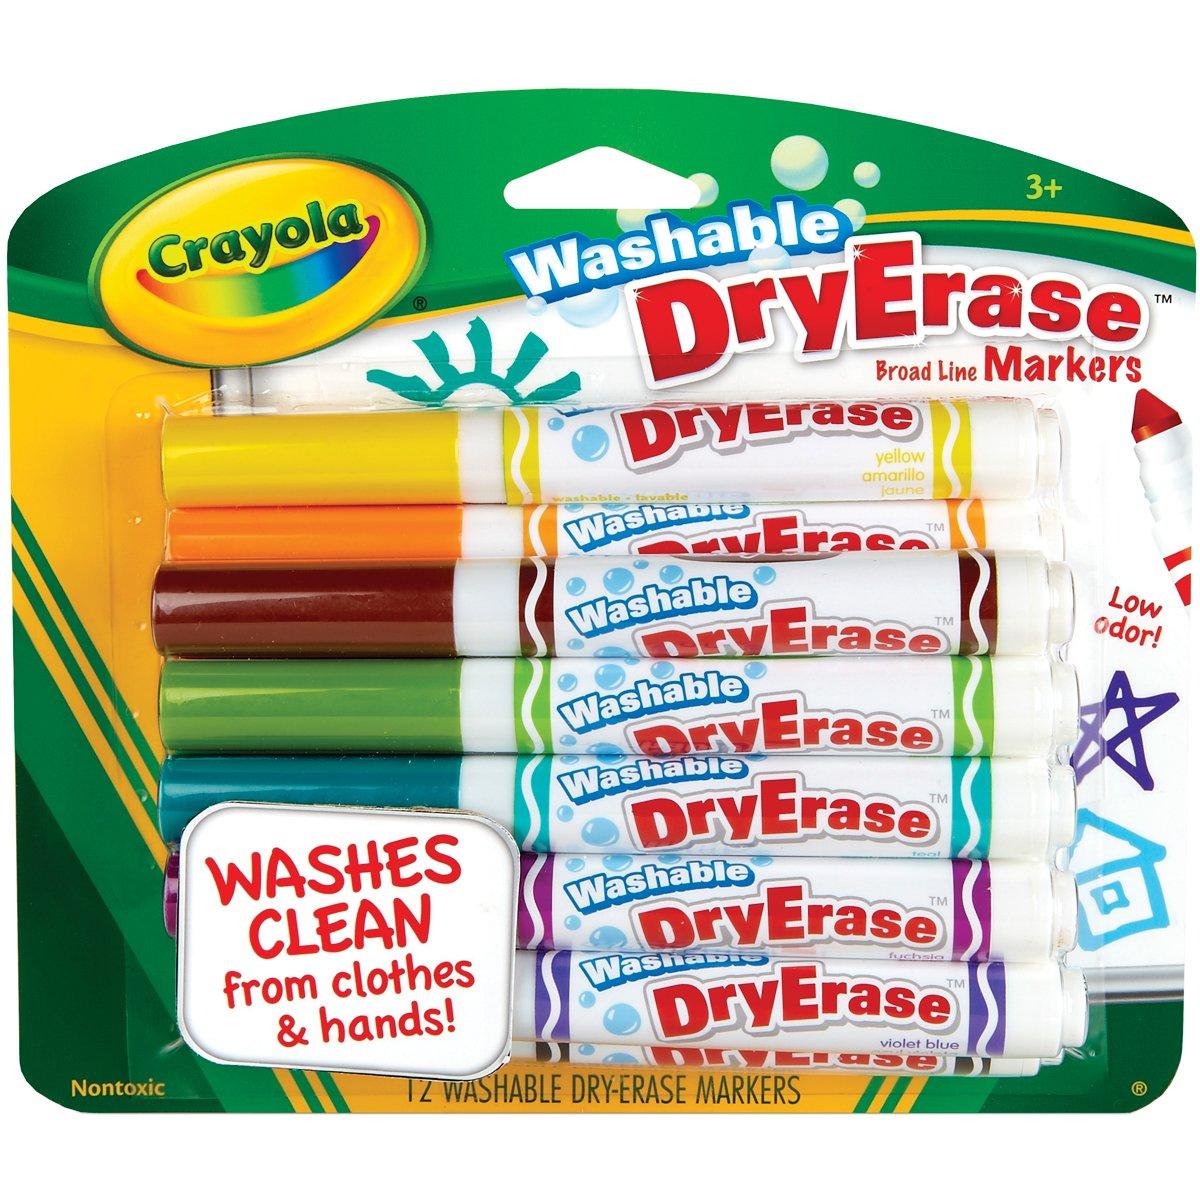 Amazoncom Crayola 12 Ct Washable Dry Erase MarkersDiscontinued by